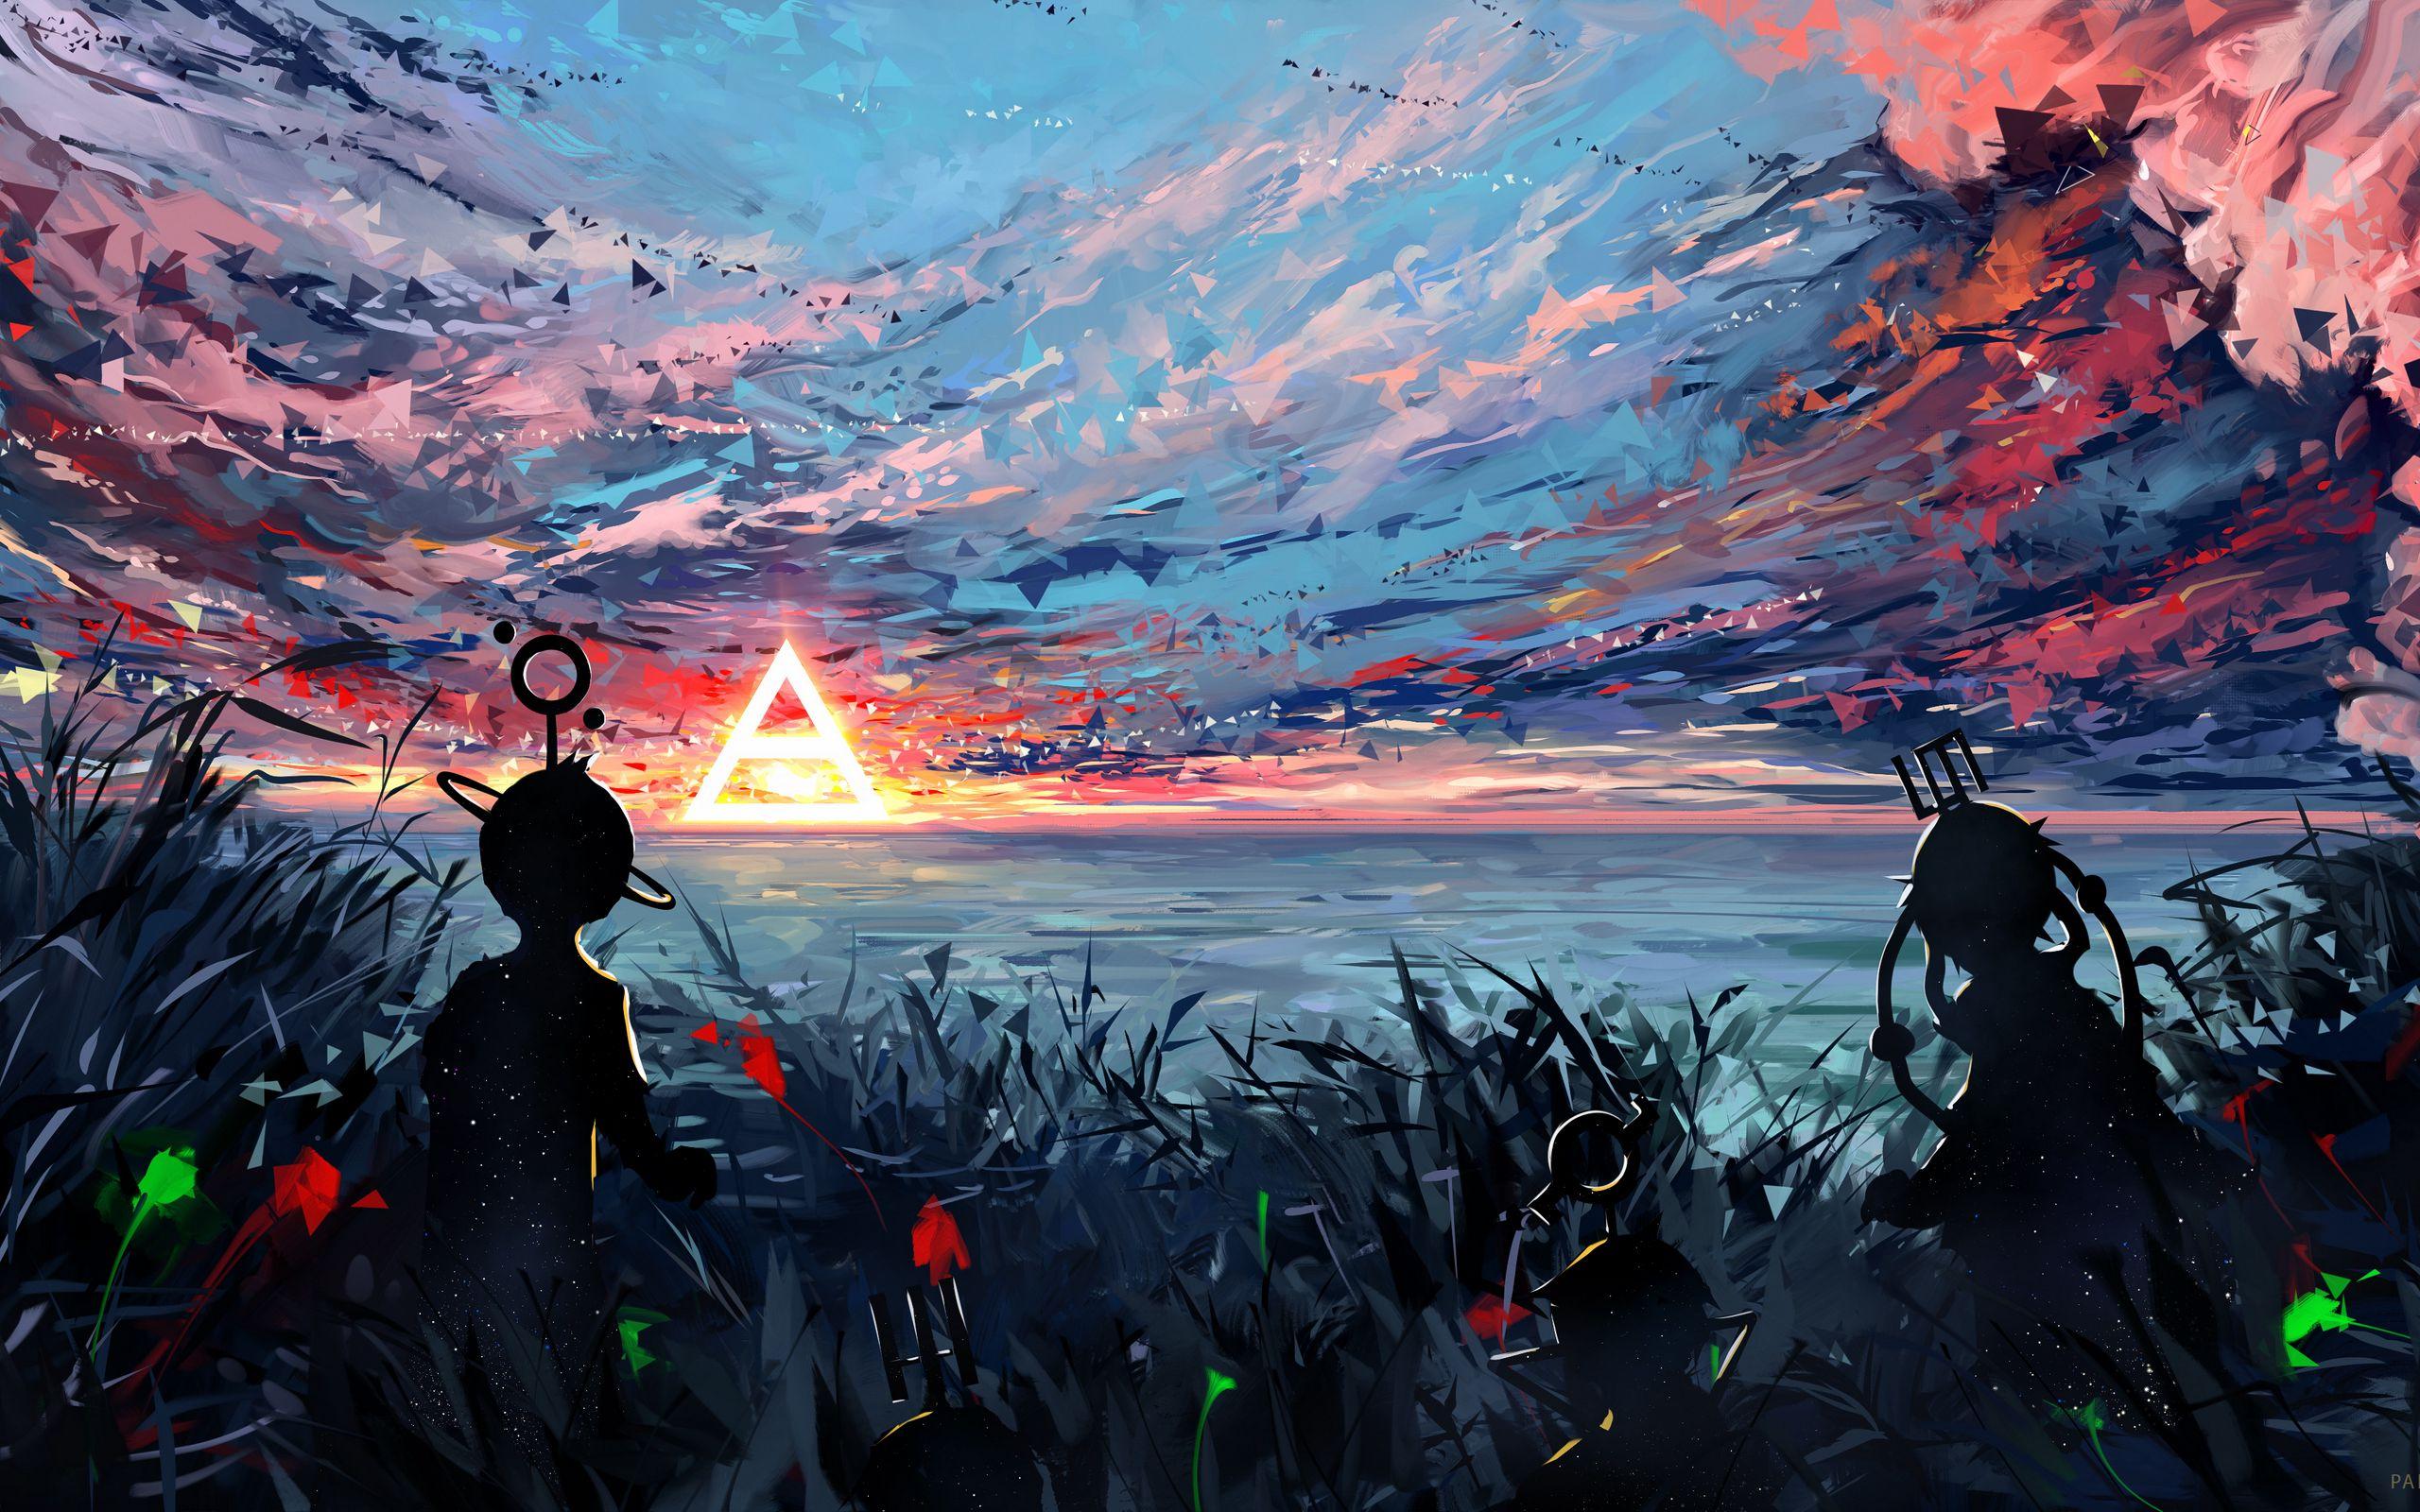 2560x1600 Wallpaper silhouette, art, sky, spots, colorful